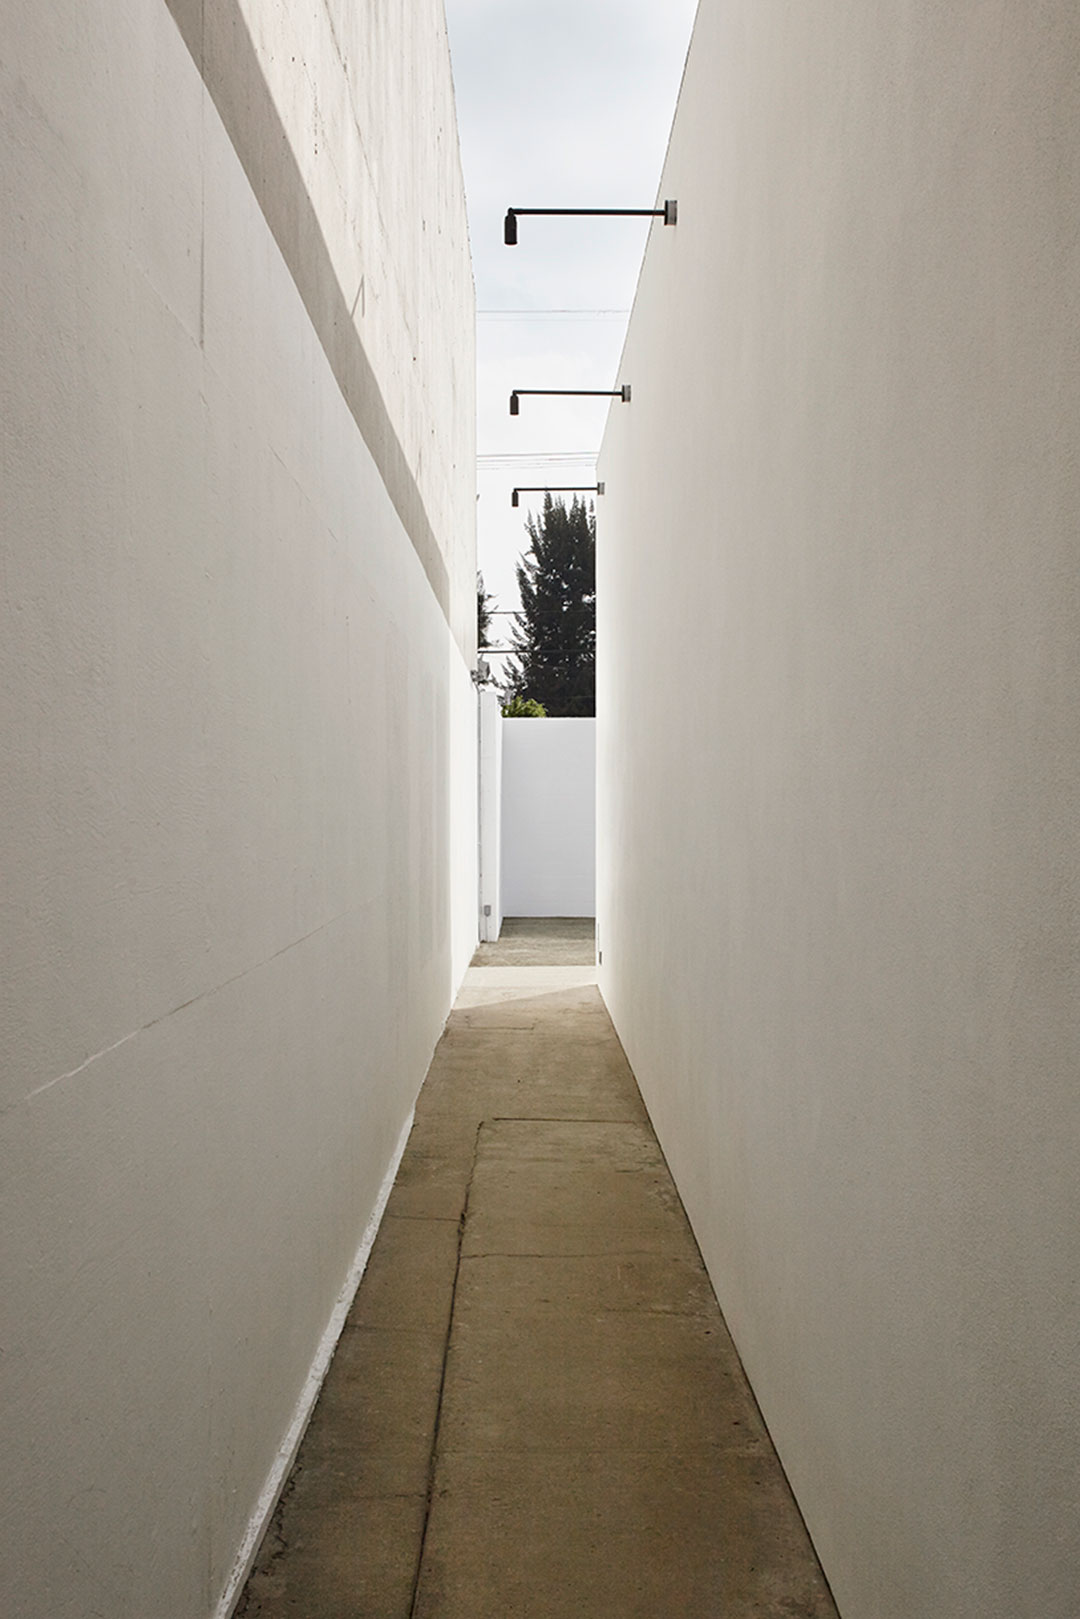 various-small-fires-corridor-la-gallery.jpg